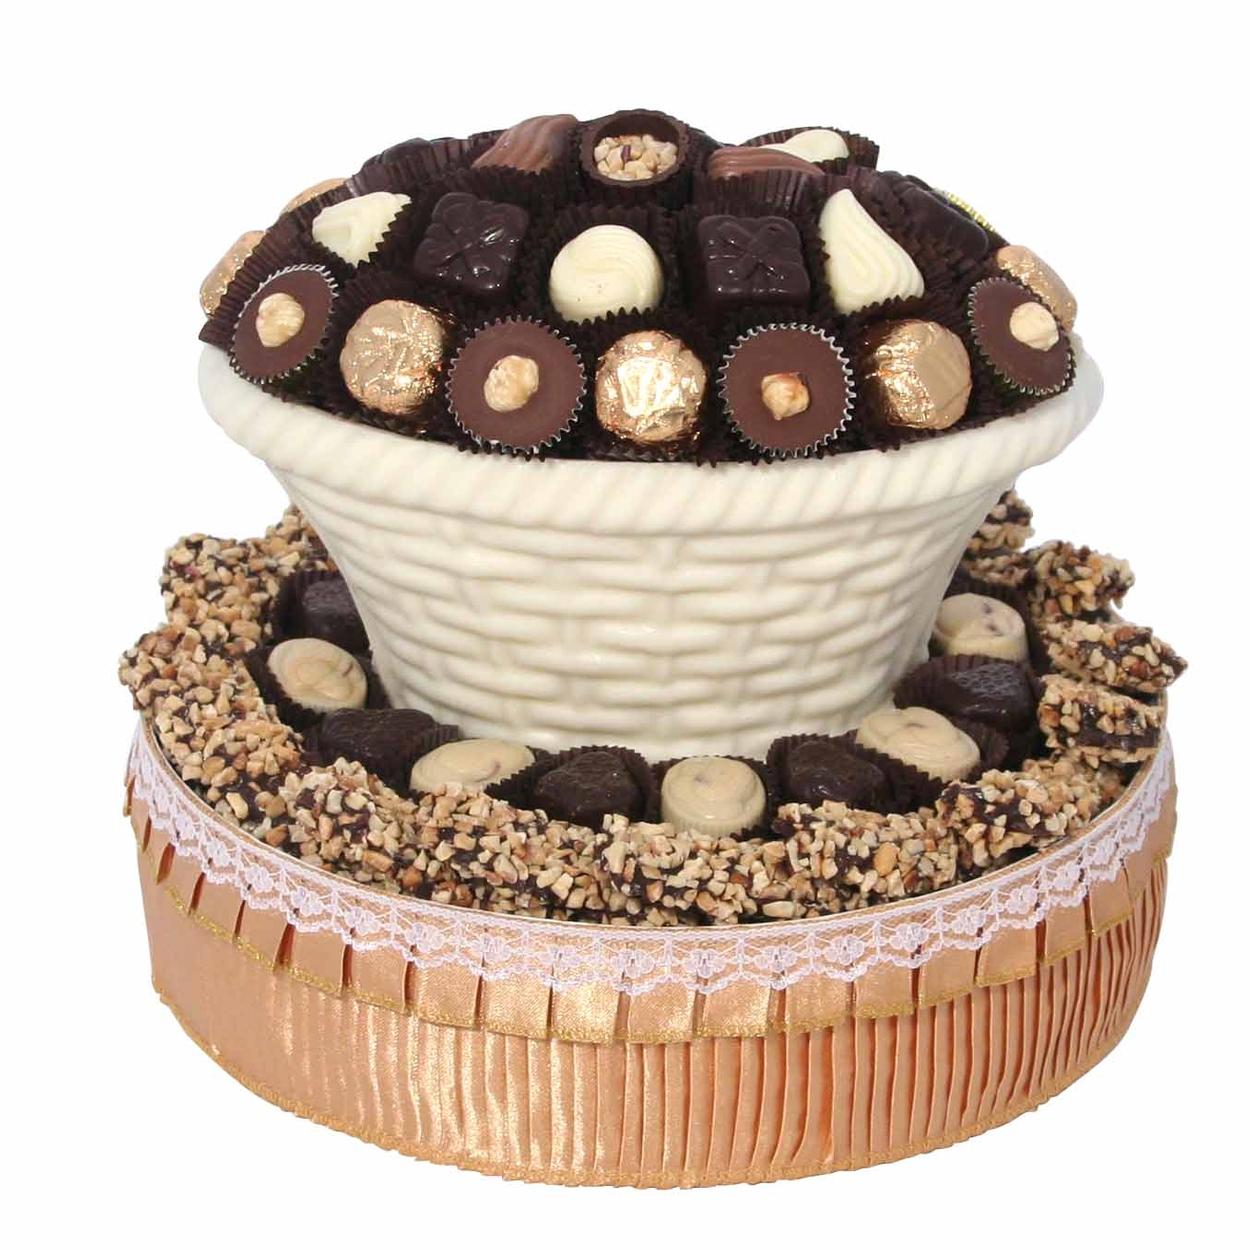 Round White Chocolate Gift Basket • Chocolate Mold Gift Baskets ...